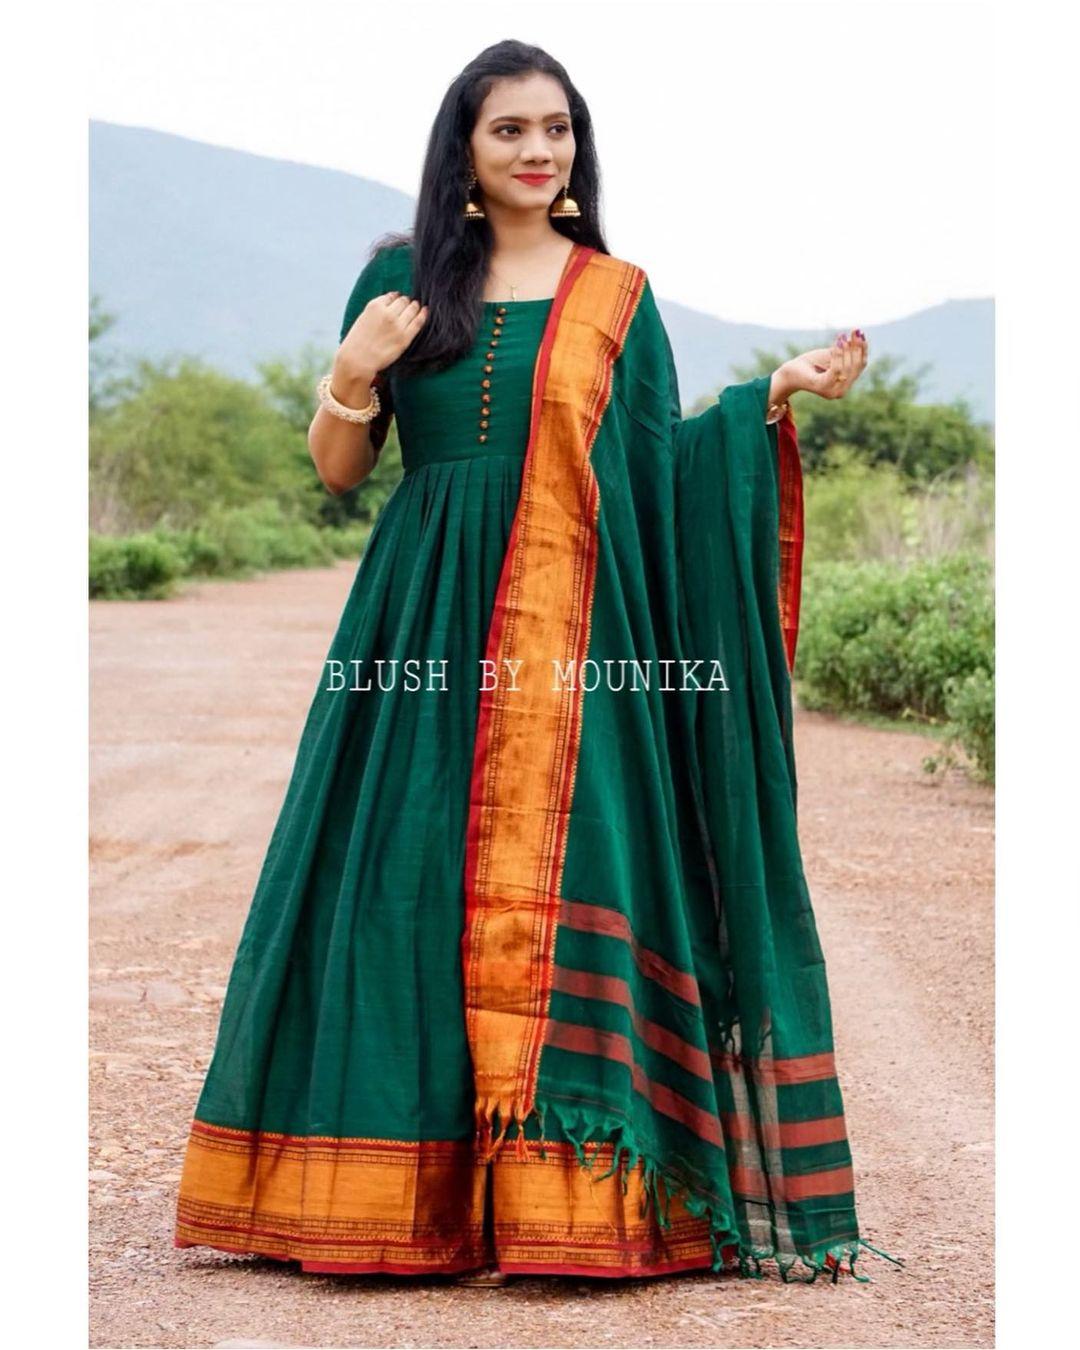 Poorvi. Price :  ₹3980.  Mercirised Handloom cotton dress with zari border paired with a Handloom dupatta with zari border. 2021-07-09